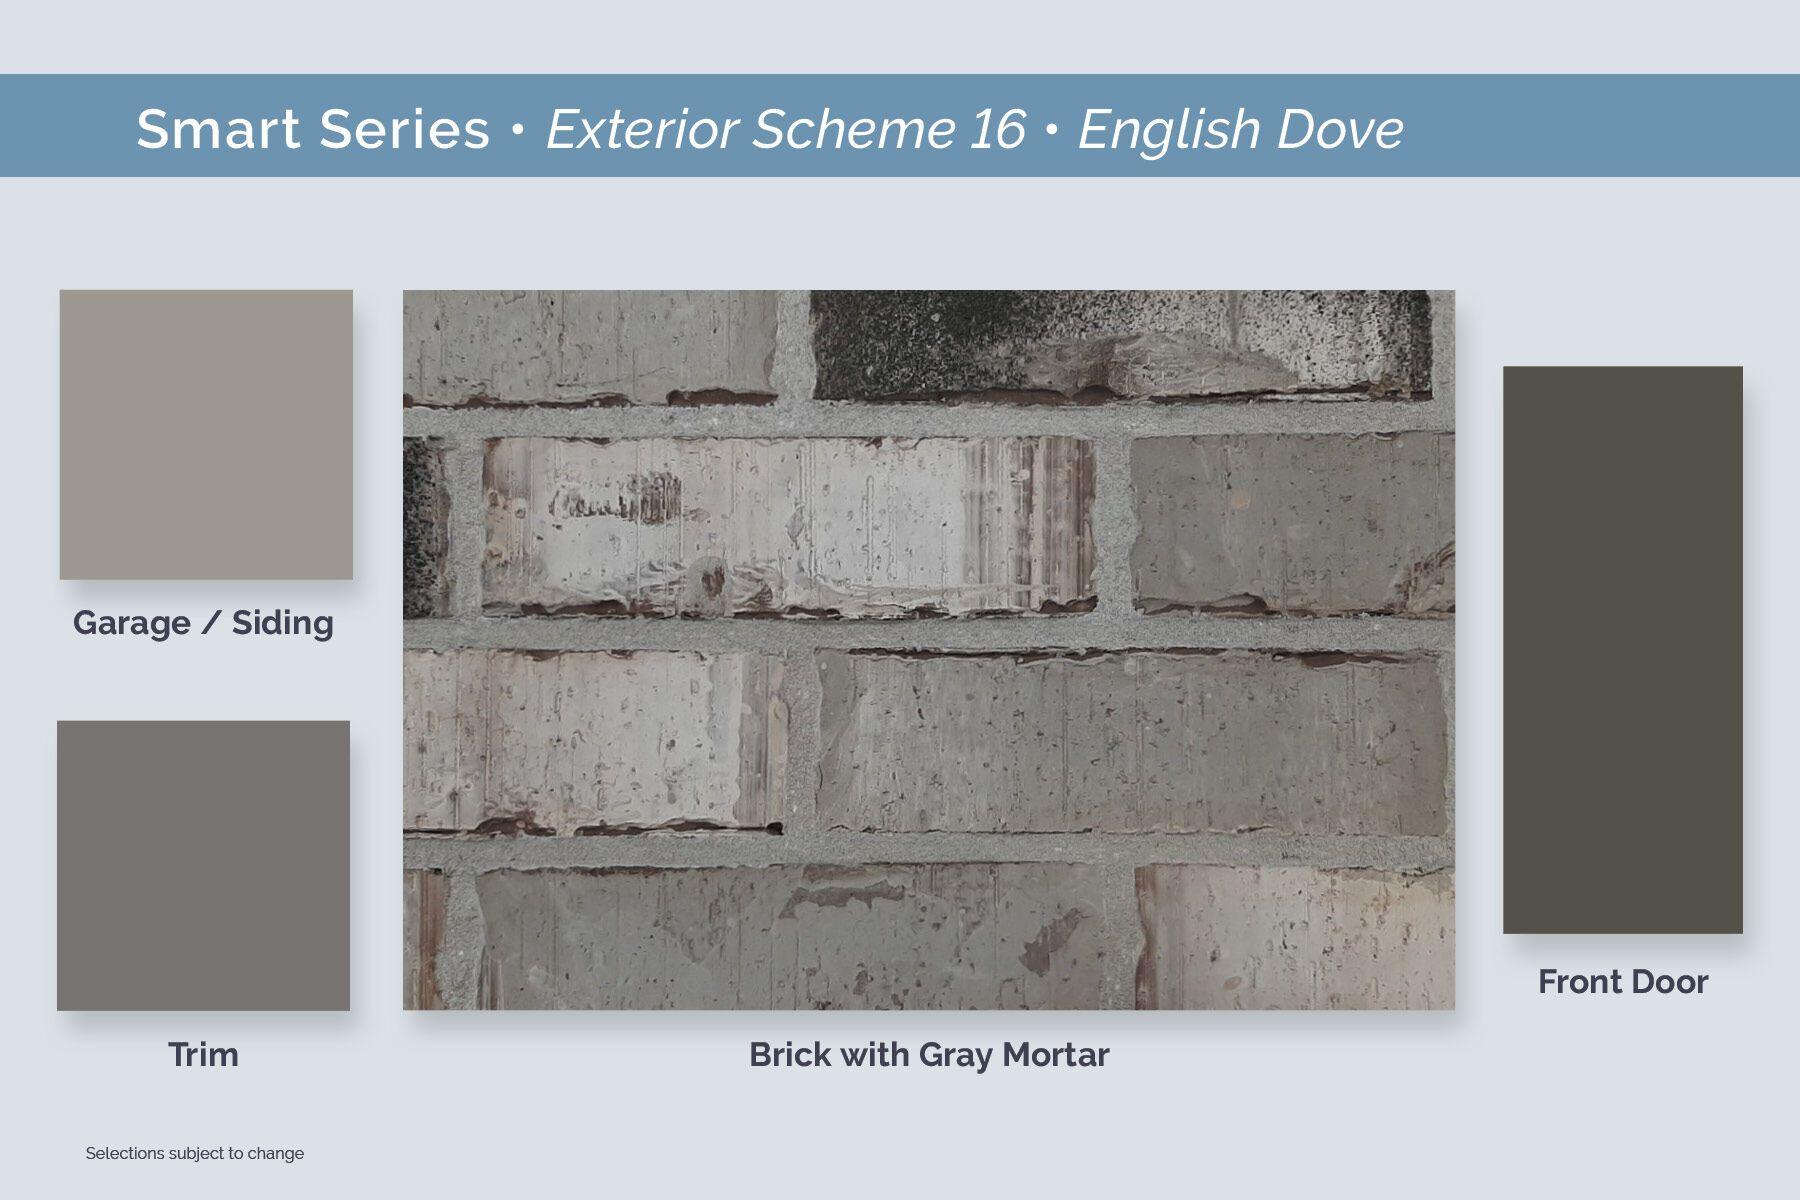 Dallas Smart Series Exterior Package 16 English Dove